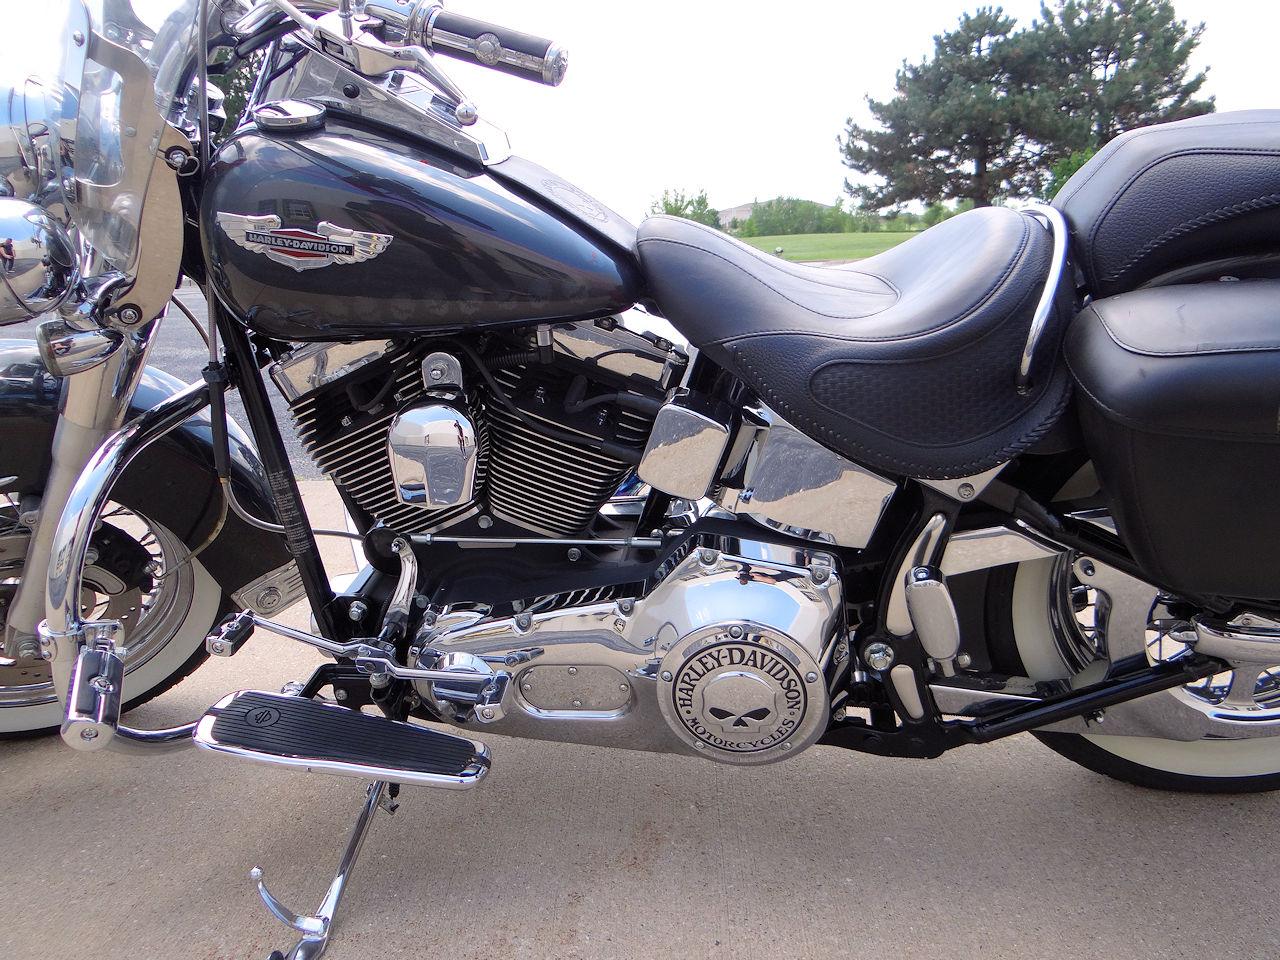 2006 Harley Davidson FLSTNI 41